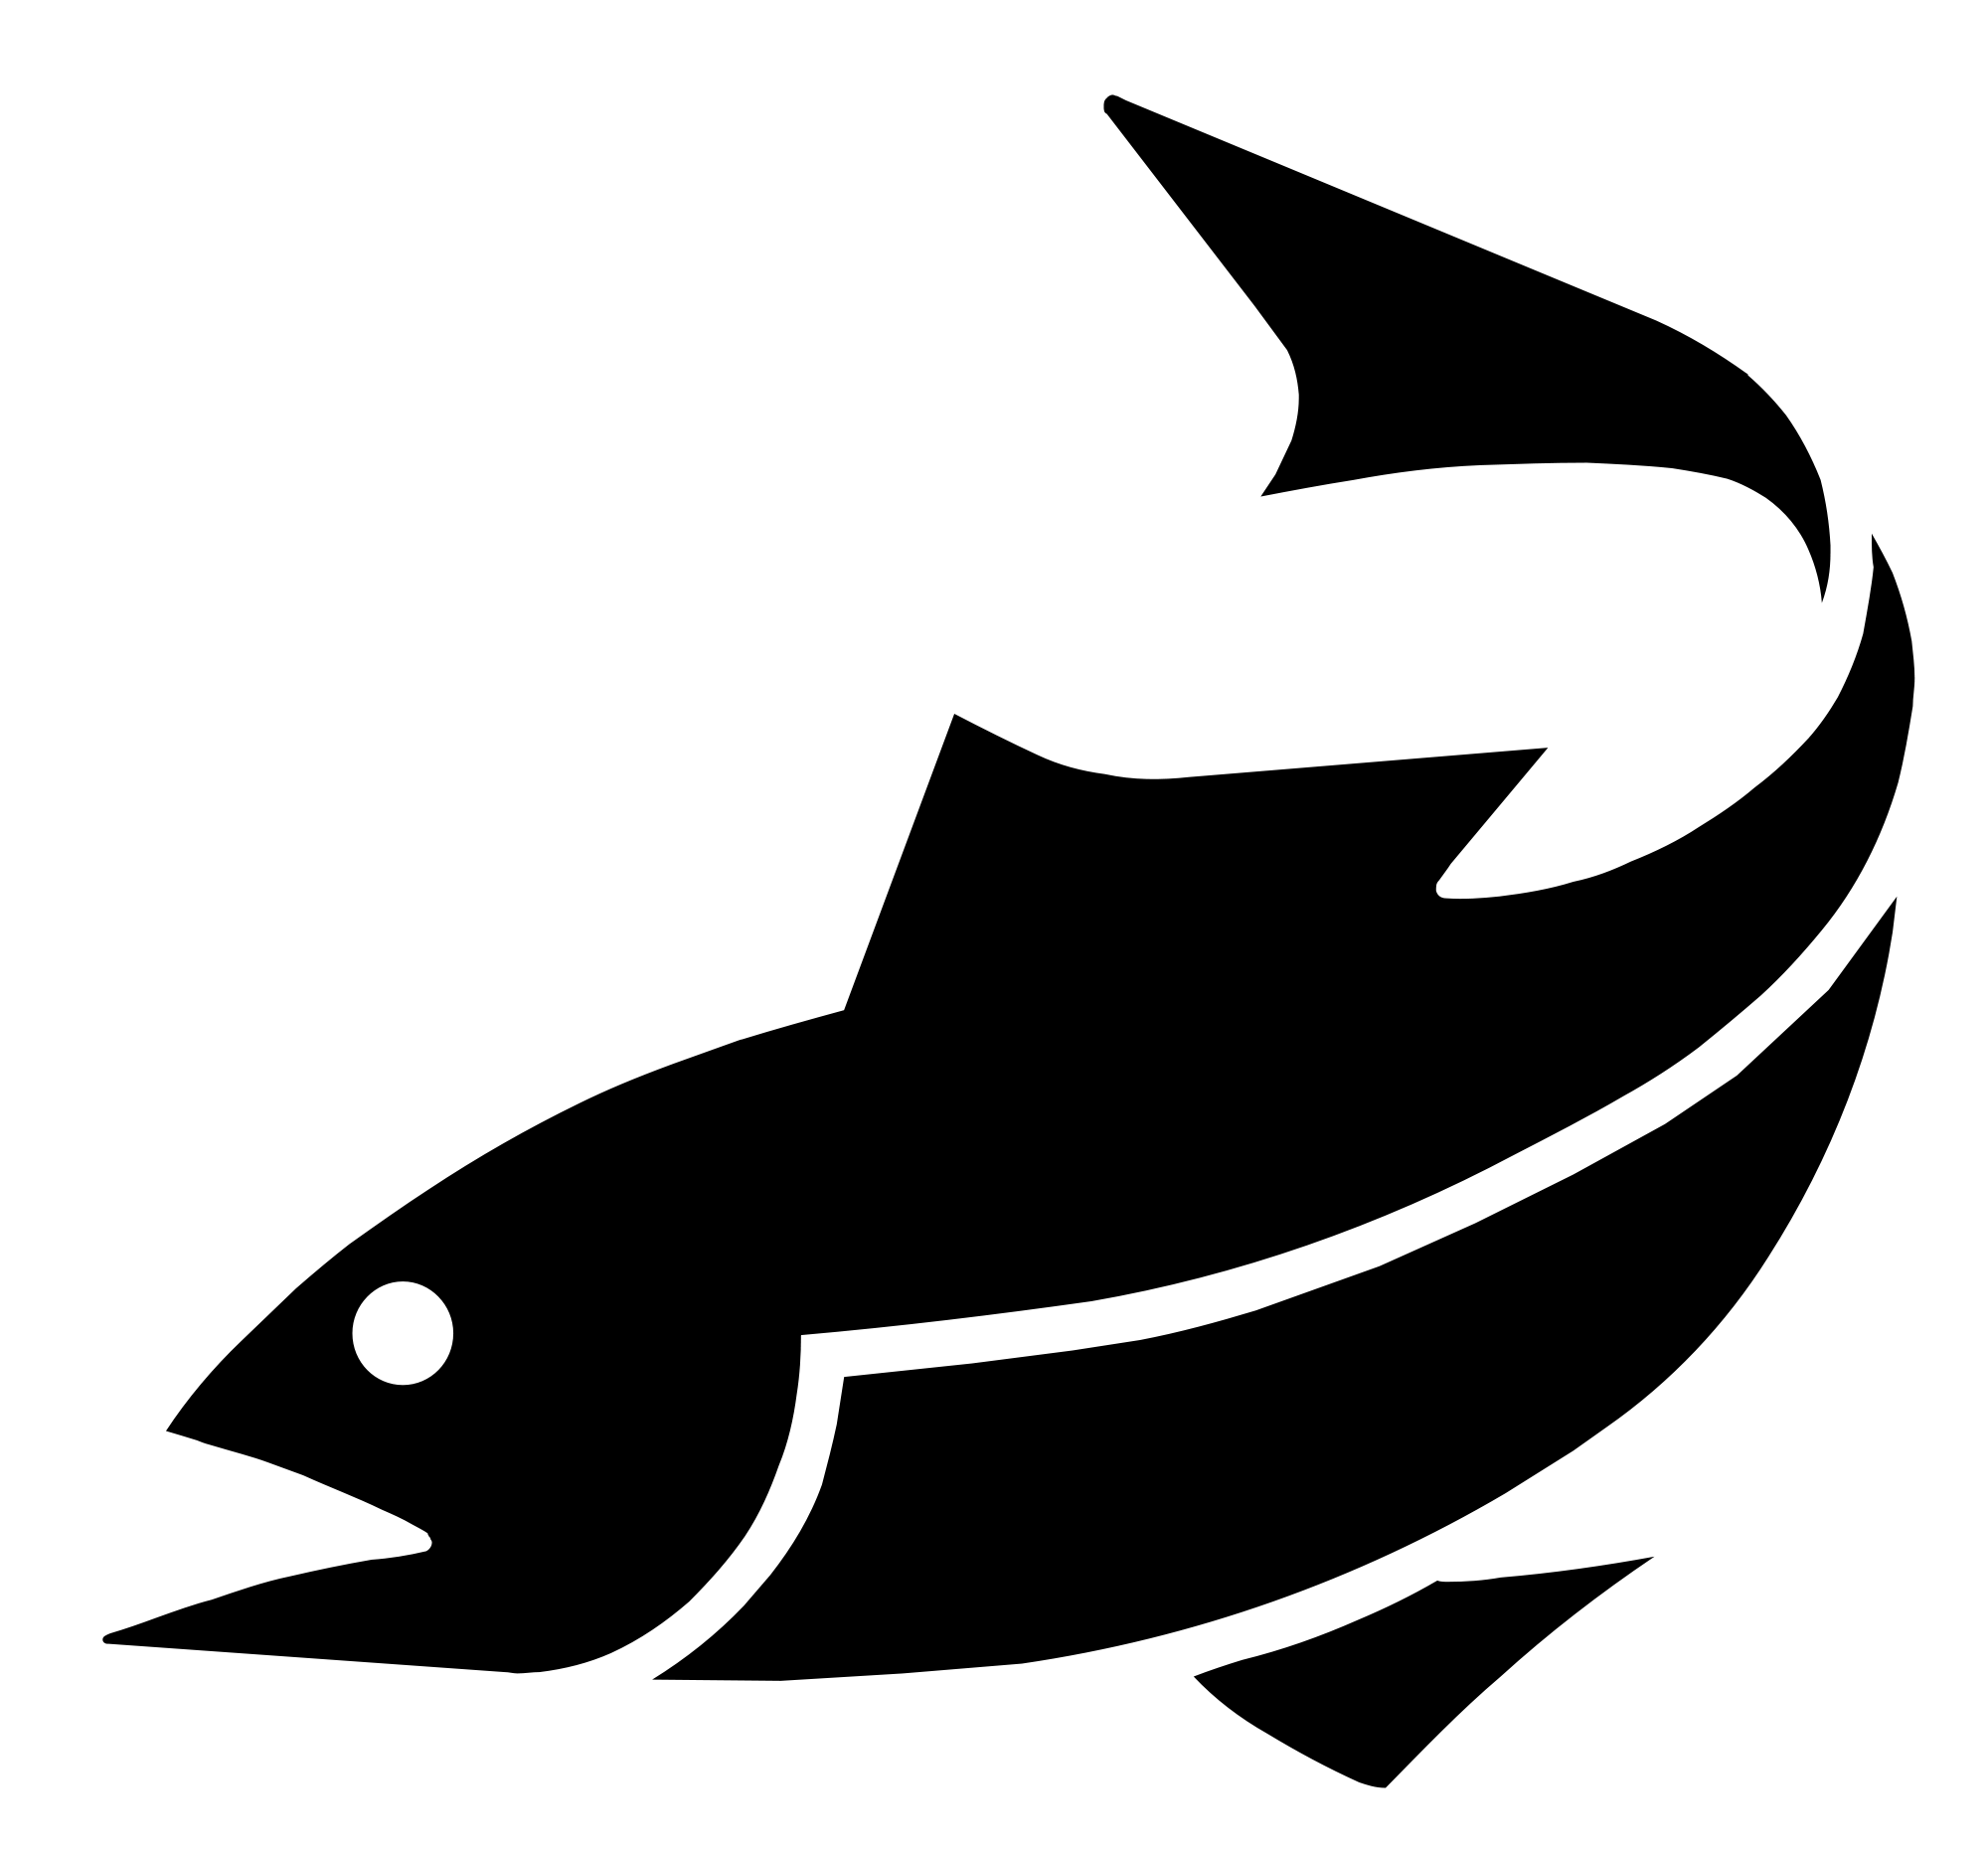 2000x1860 Filefish Icon.svg